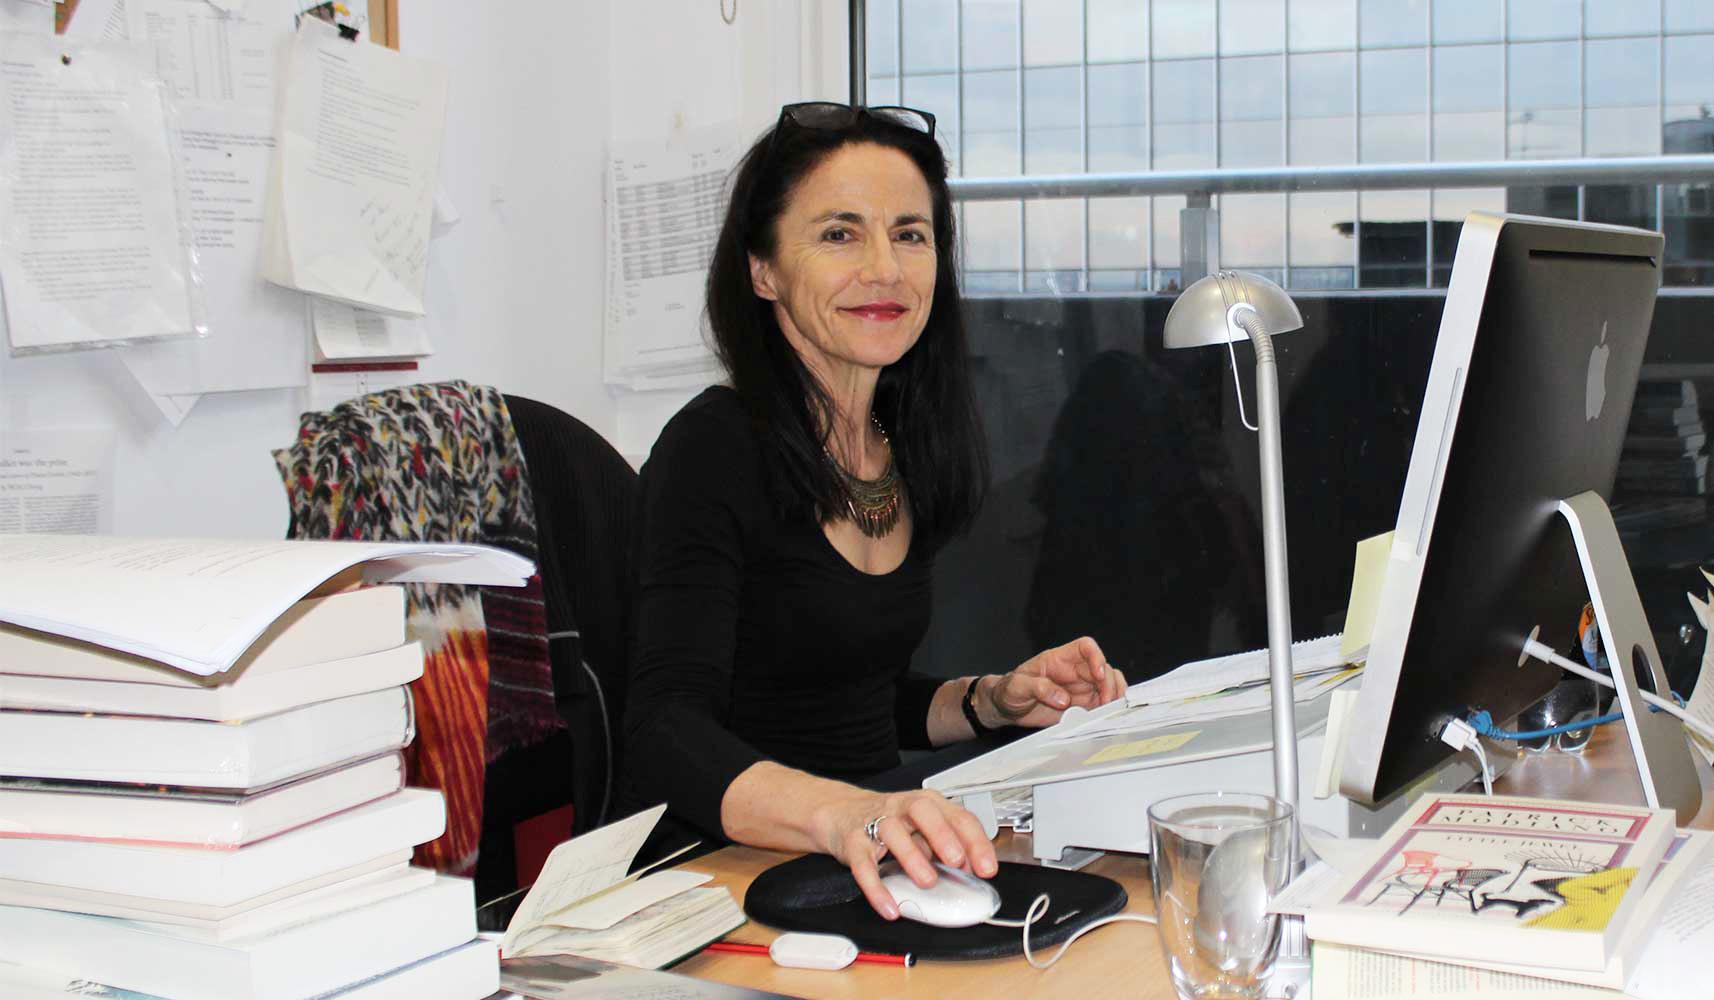 Penny Hueston at her editor's desk